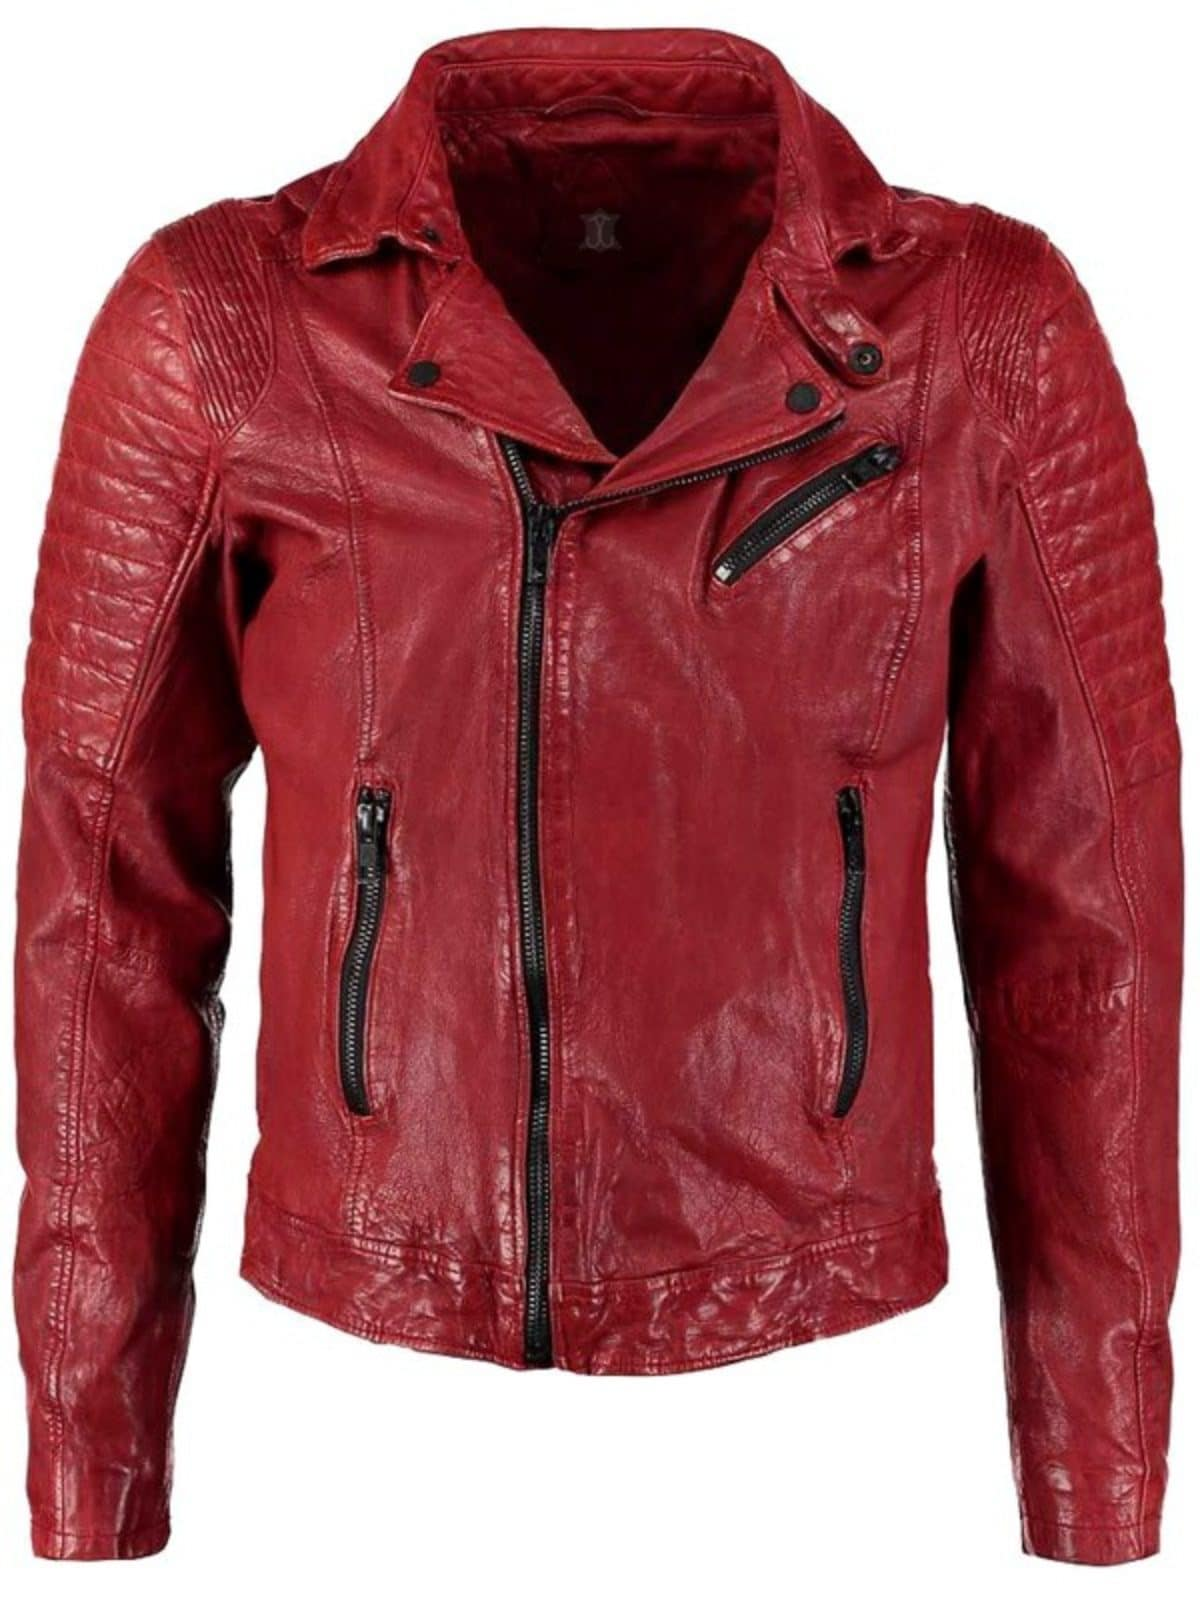 Women/'s Short Collar Waxed 100/% Sheepskin Leather Jacket Red